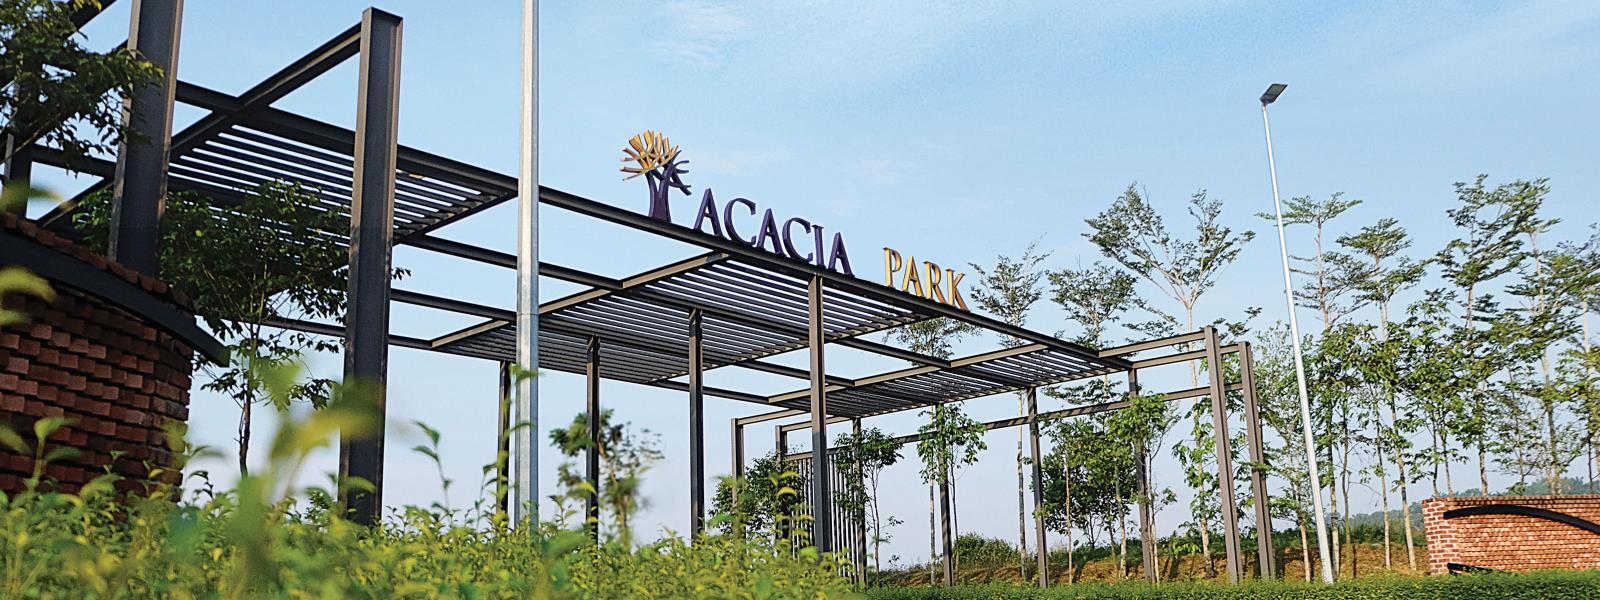 Acacia Park 4A